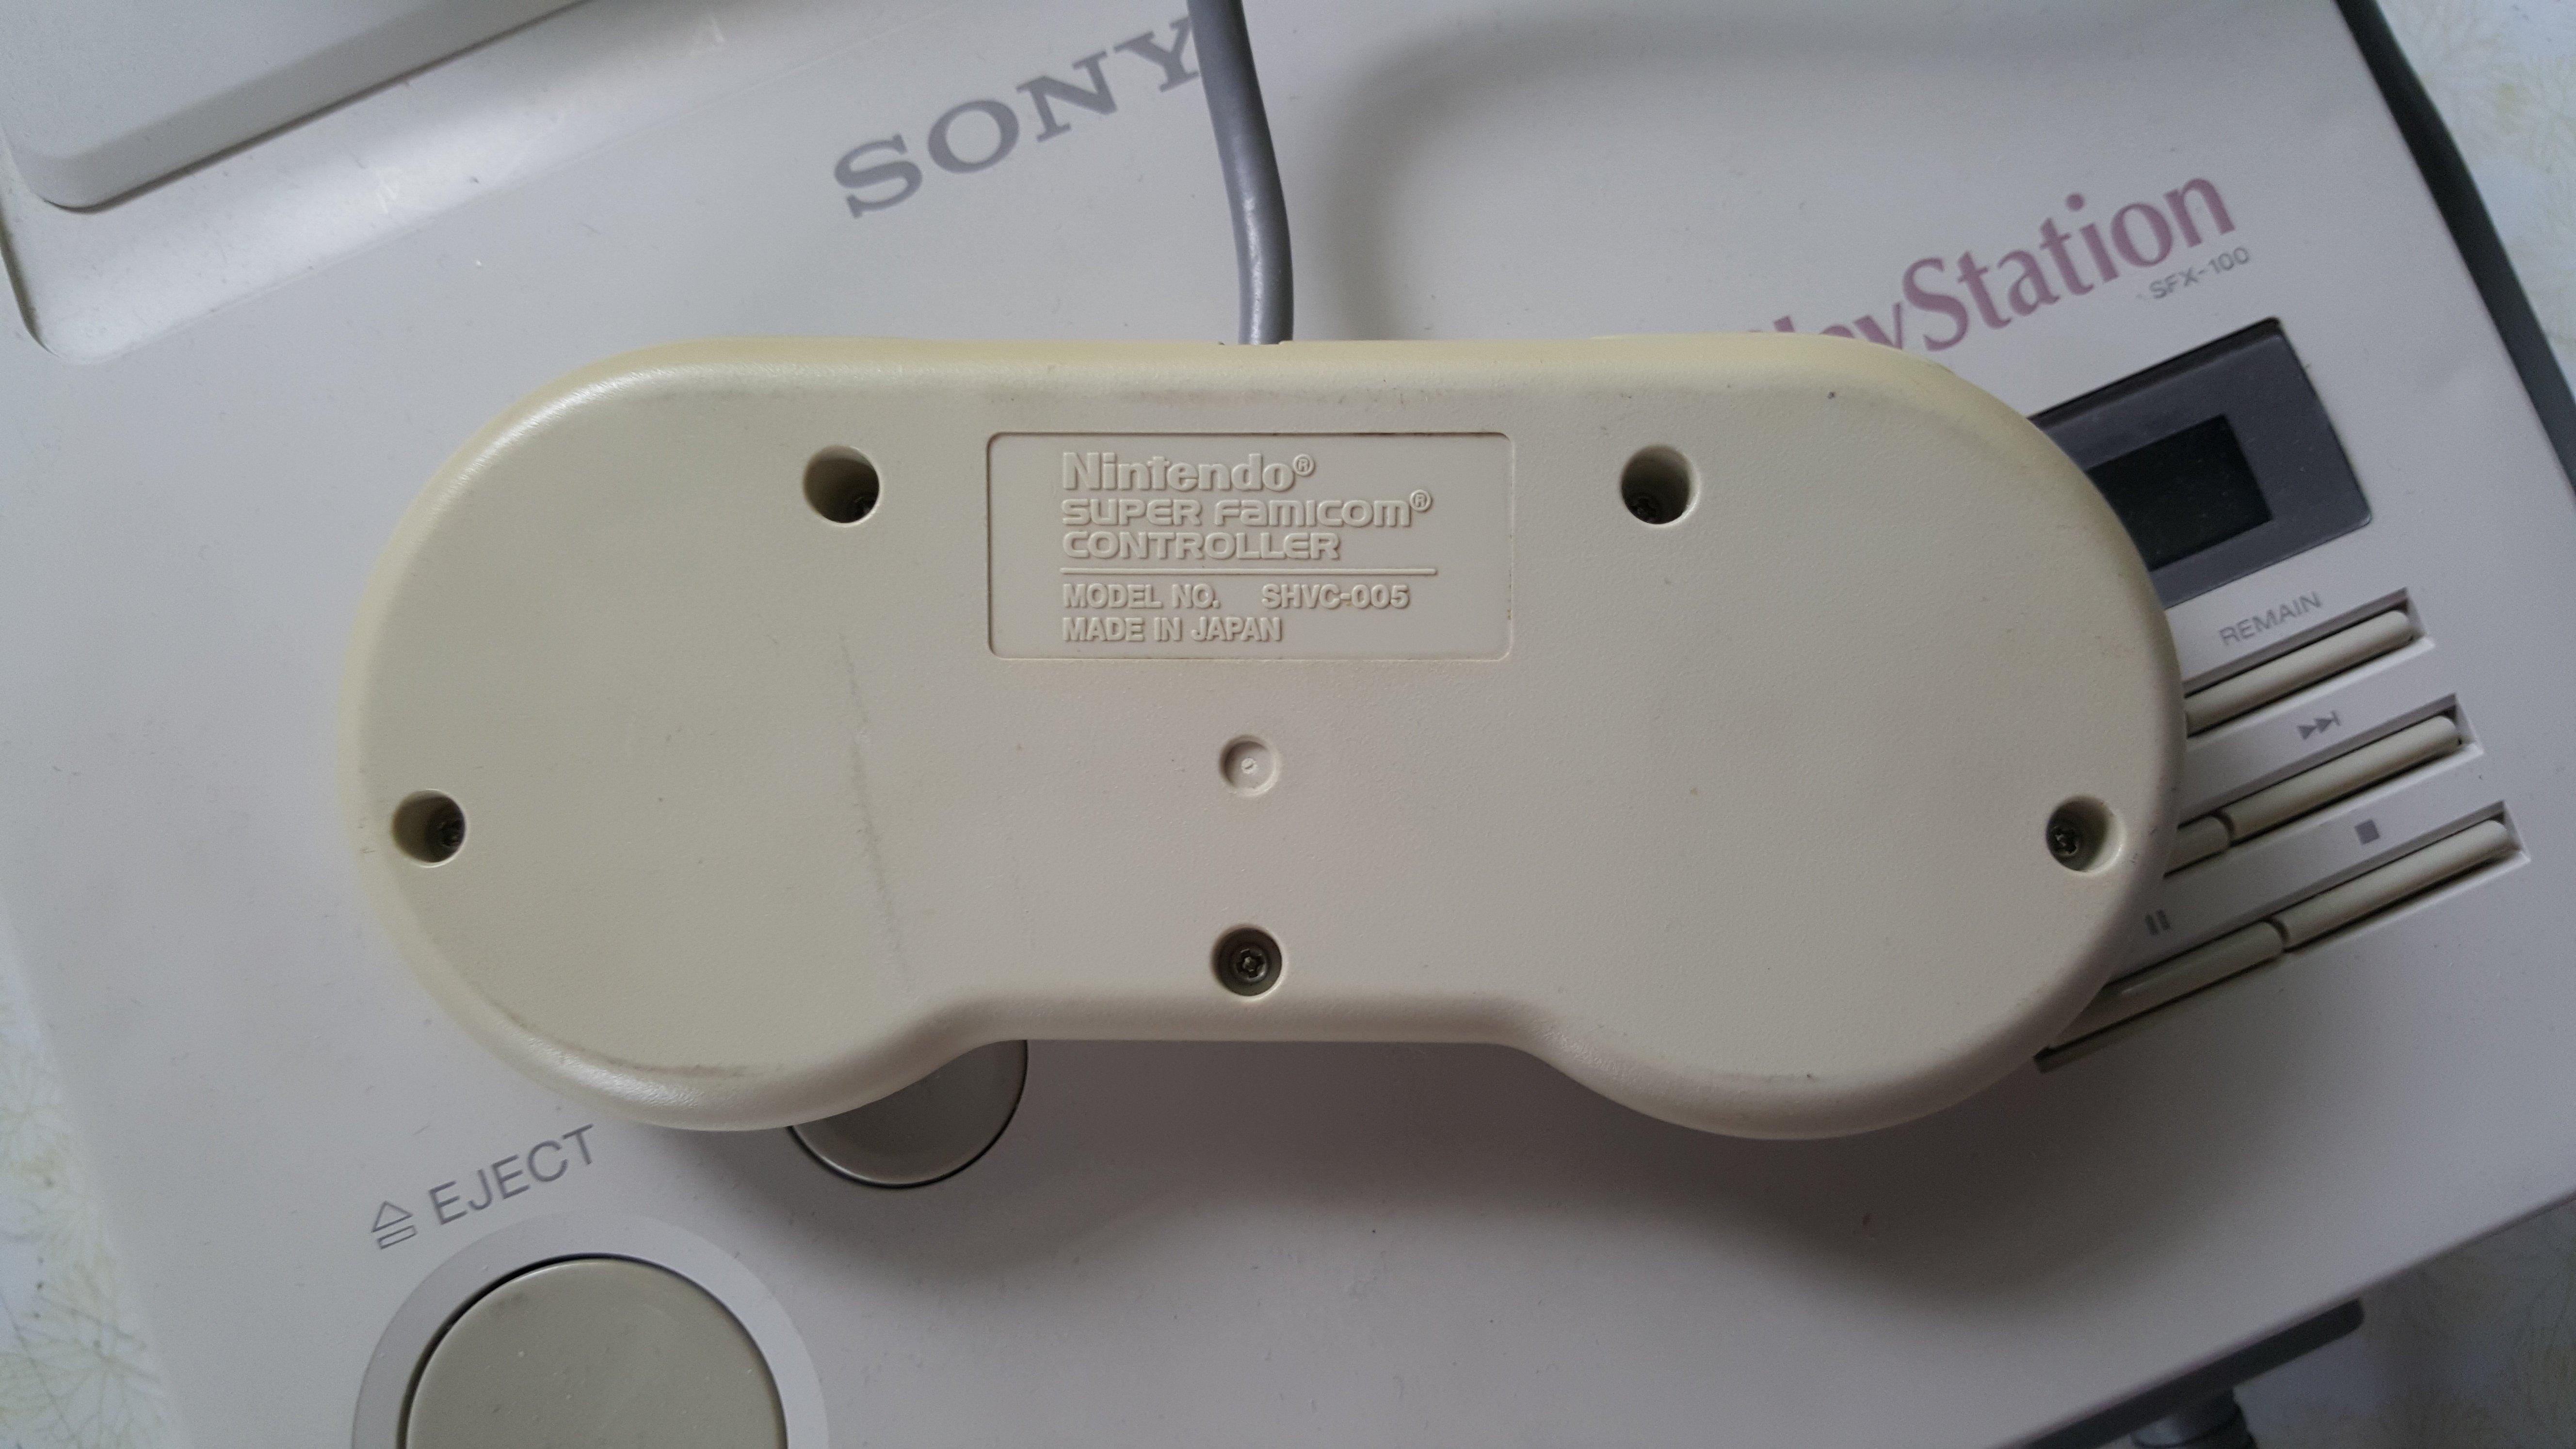 Une personne possède le prototype PlayStation Super Nintendo  PlayStation_Prototype_-5-